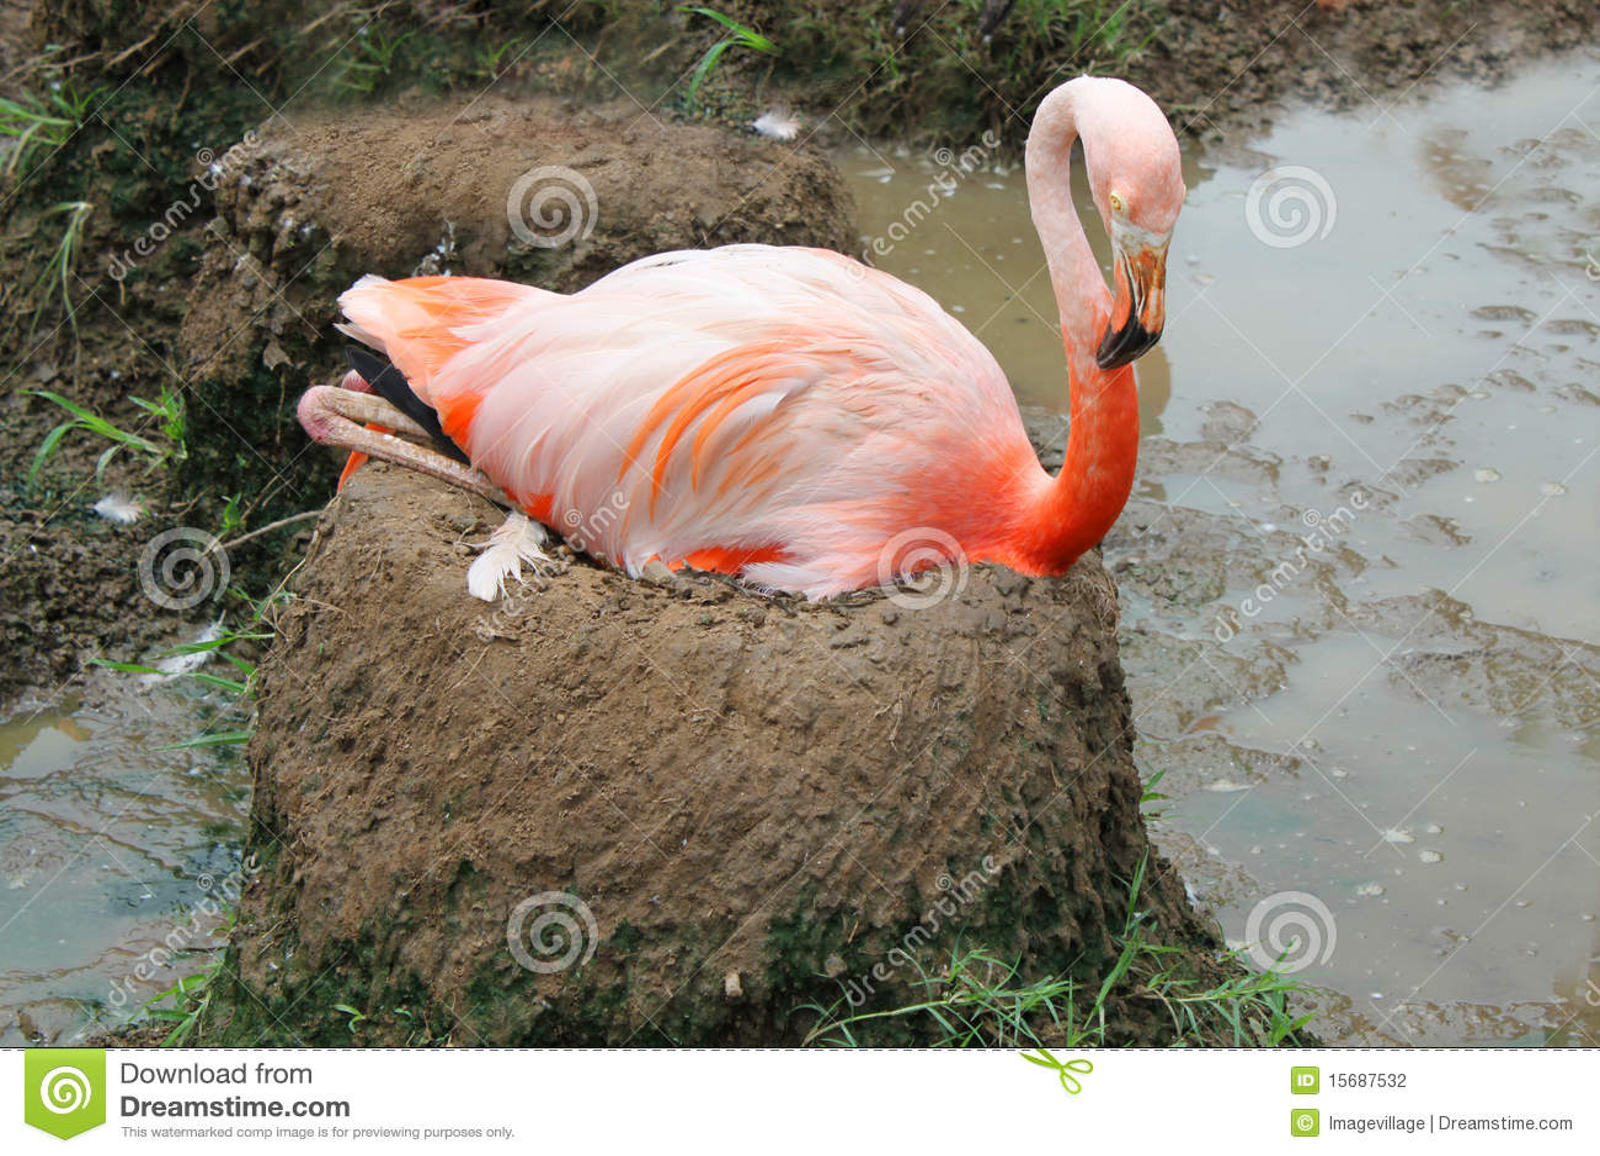 Flamingo nest - photo#3